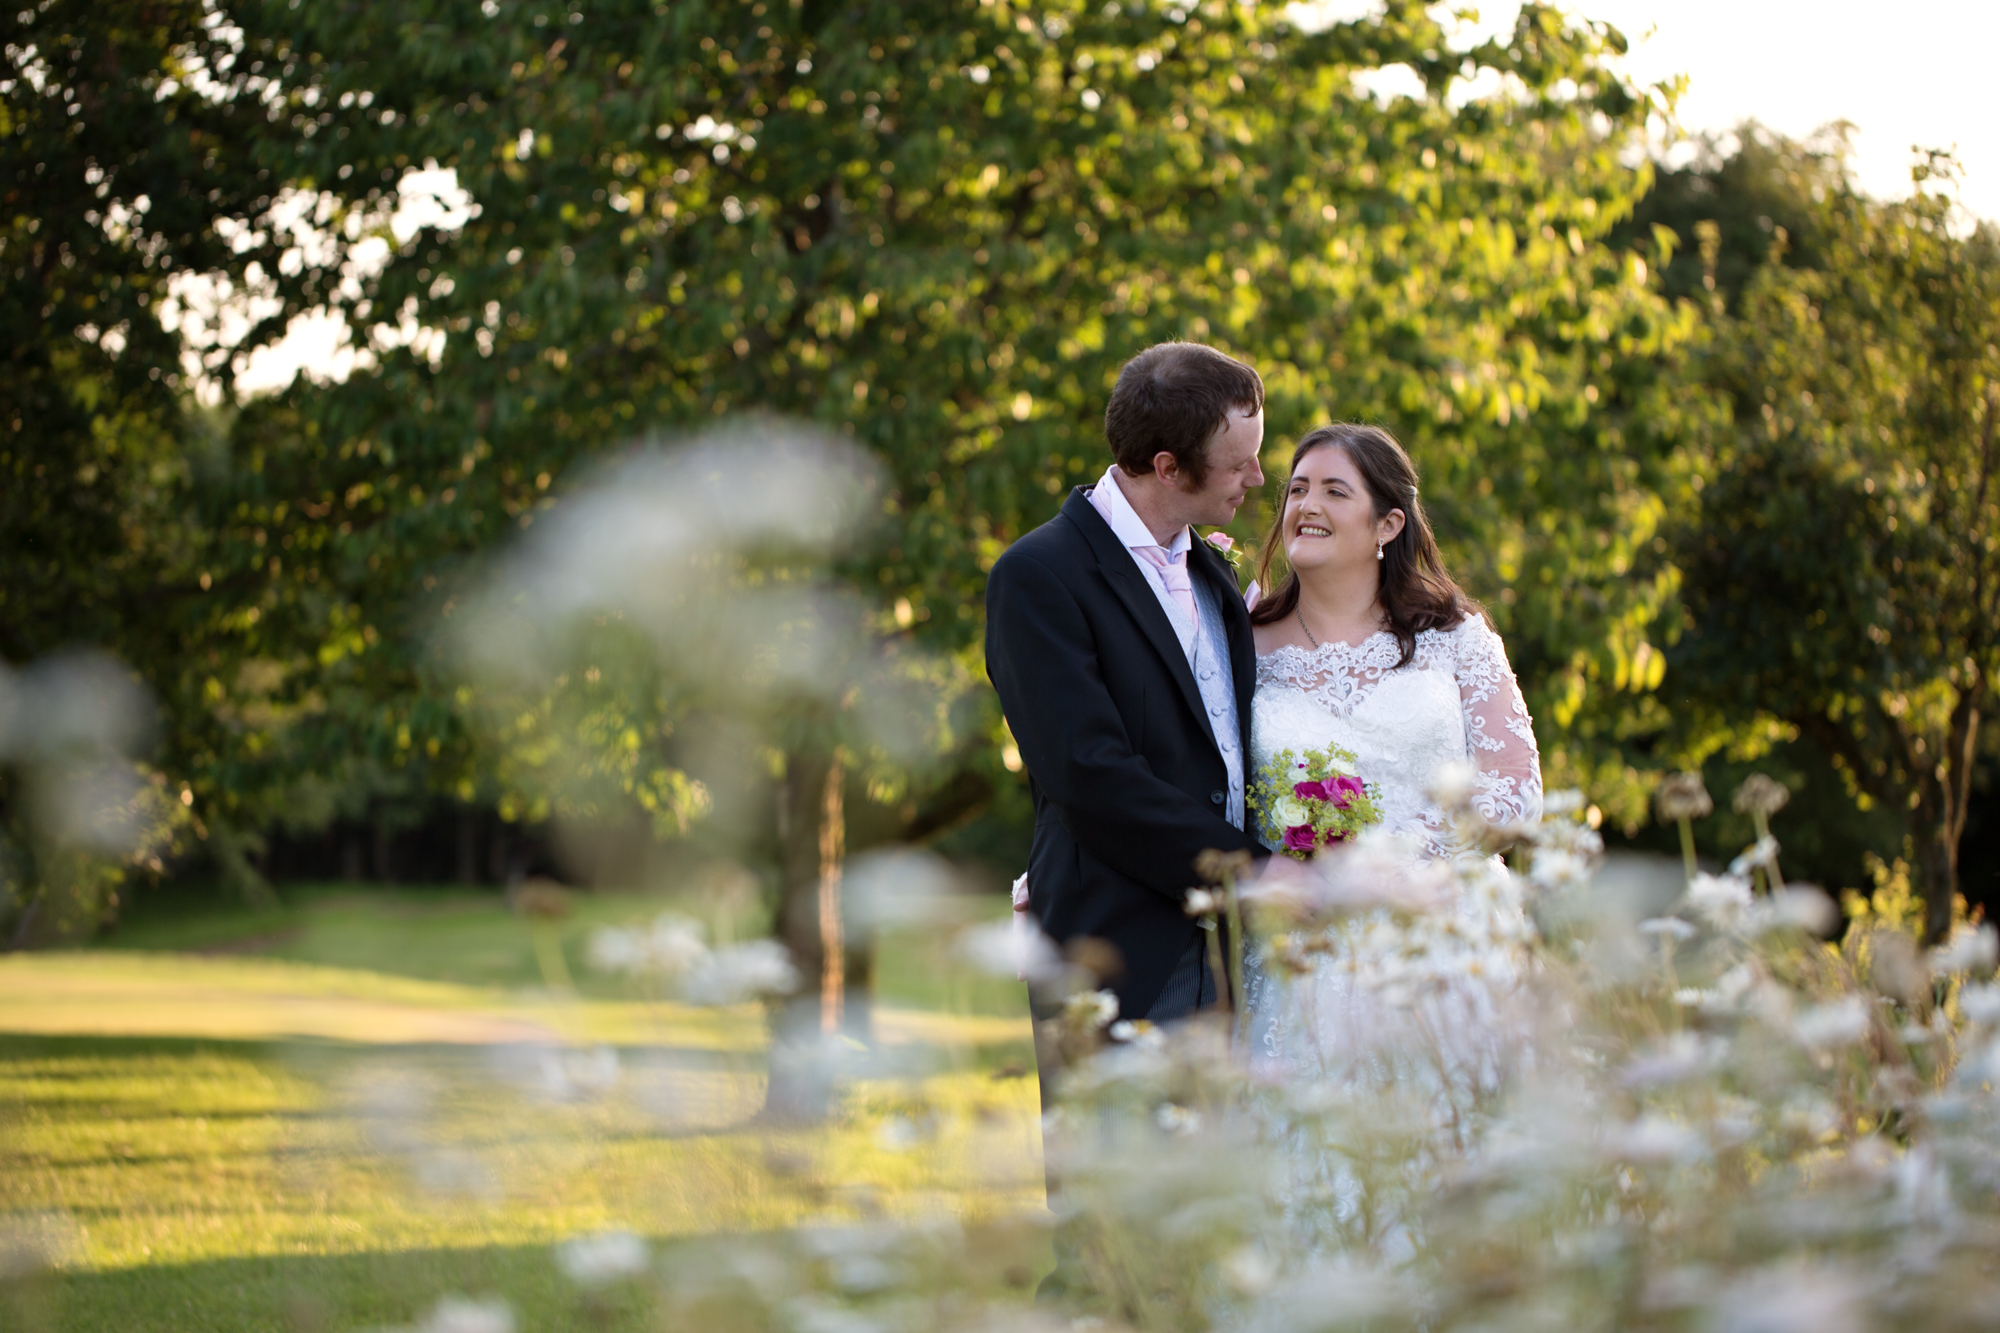 Bride and groom portraits at Ridgeway golf club, Caerphilly mountain, Thornhill